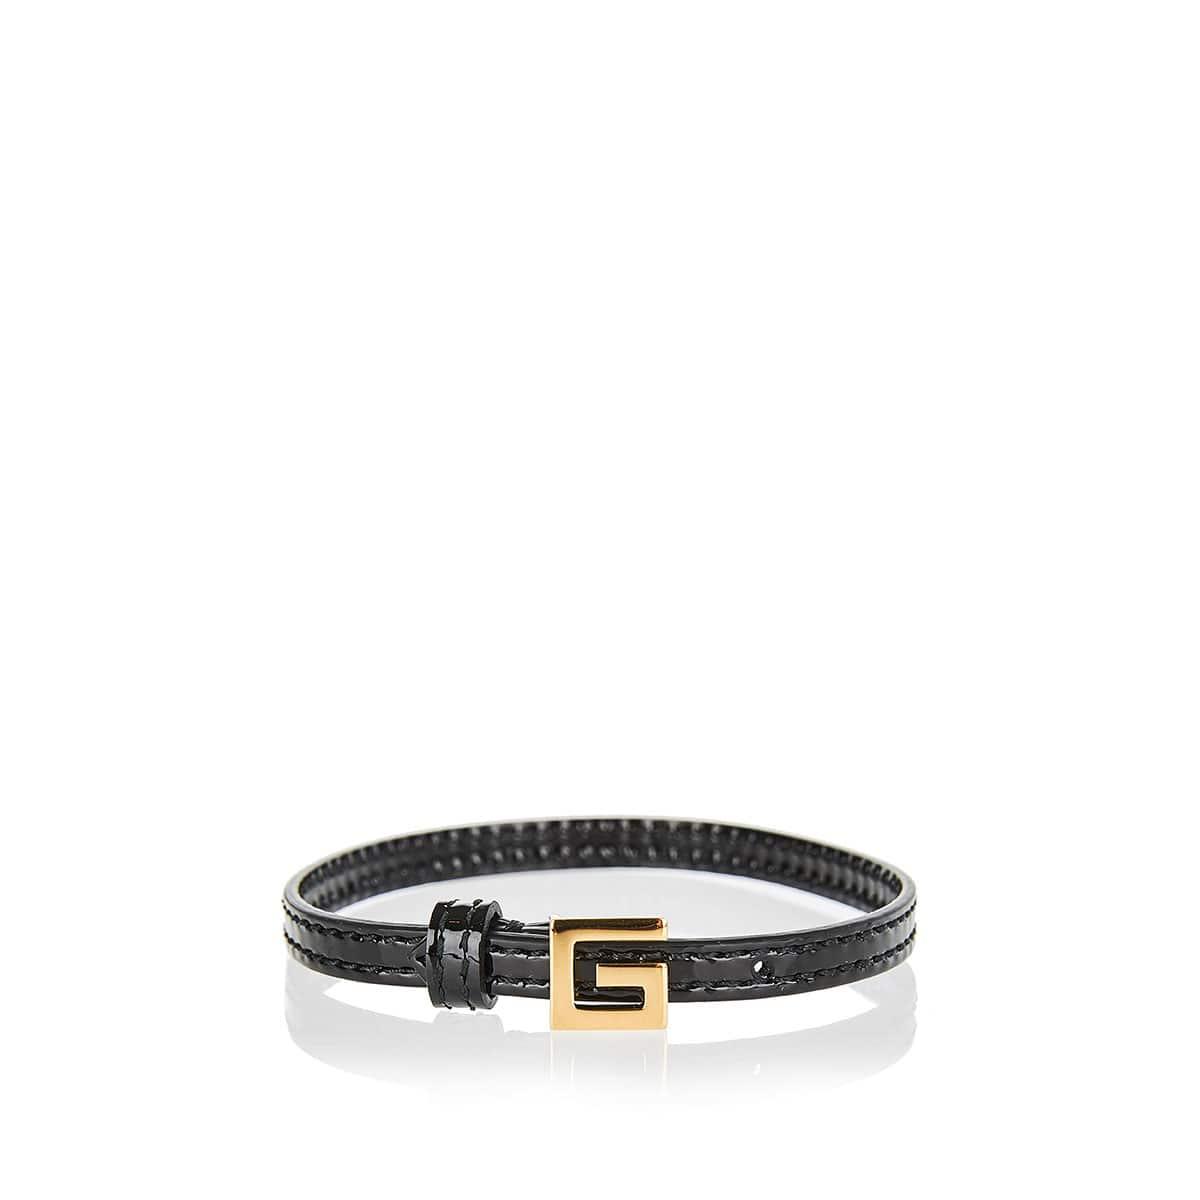 Patent bracelet with Square G